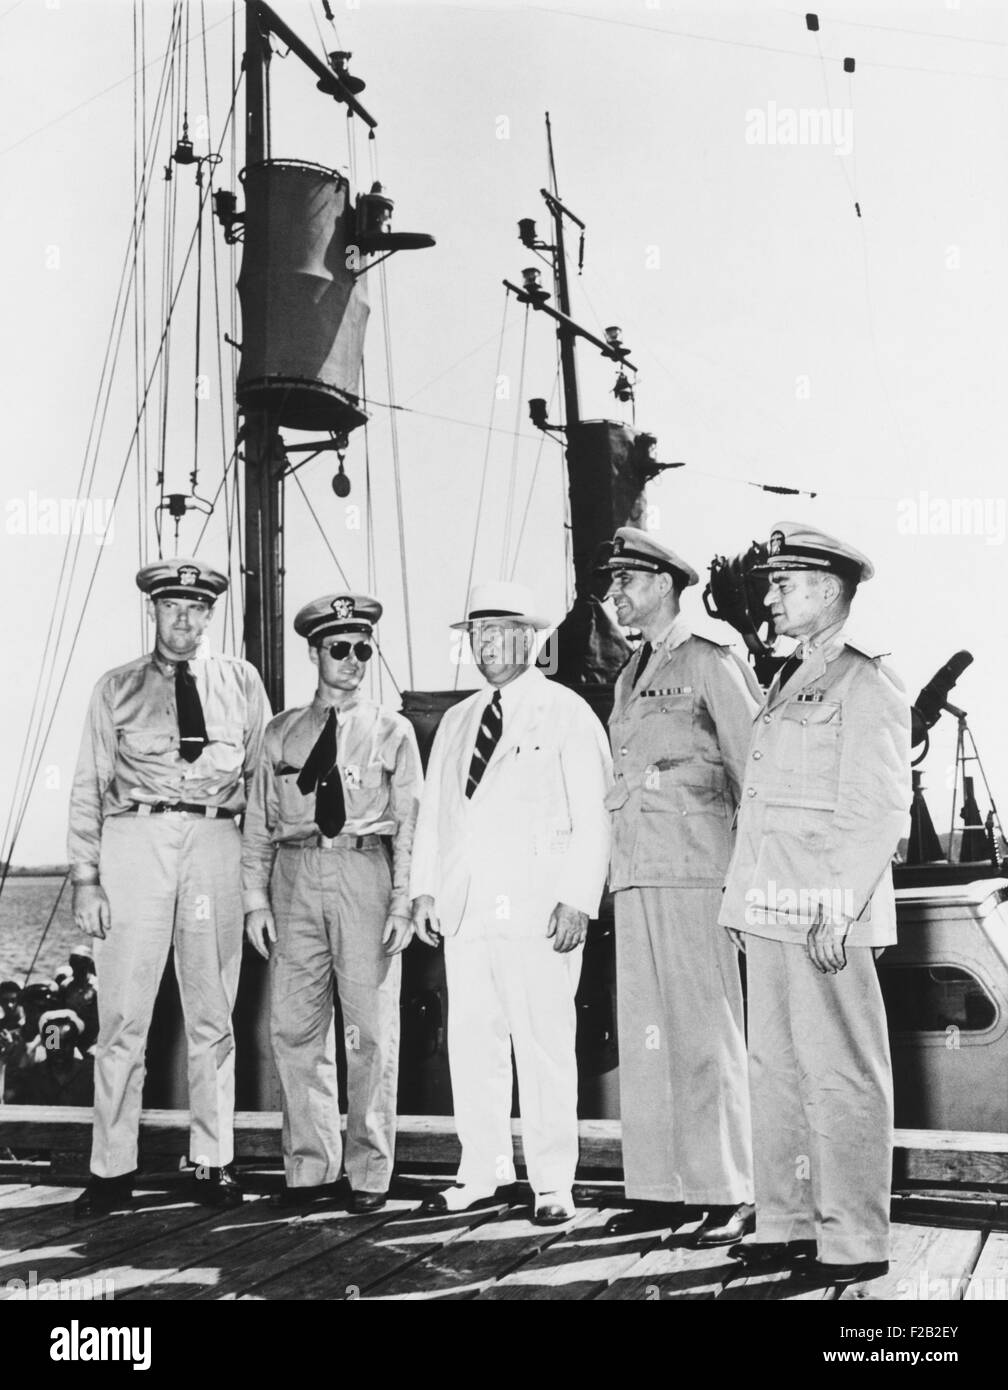 Navy Secretary Frank Knox on inspection tour to heighten anti-submarine defenses. July 19, 1942 in Charleston, SC. Stock Photo